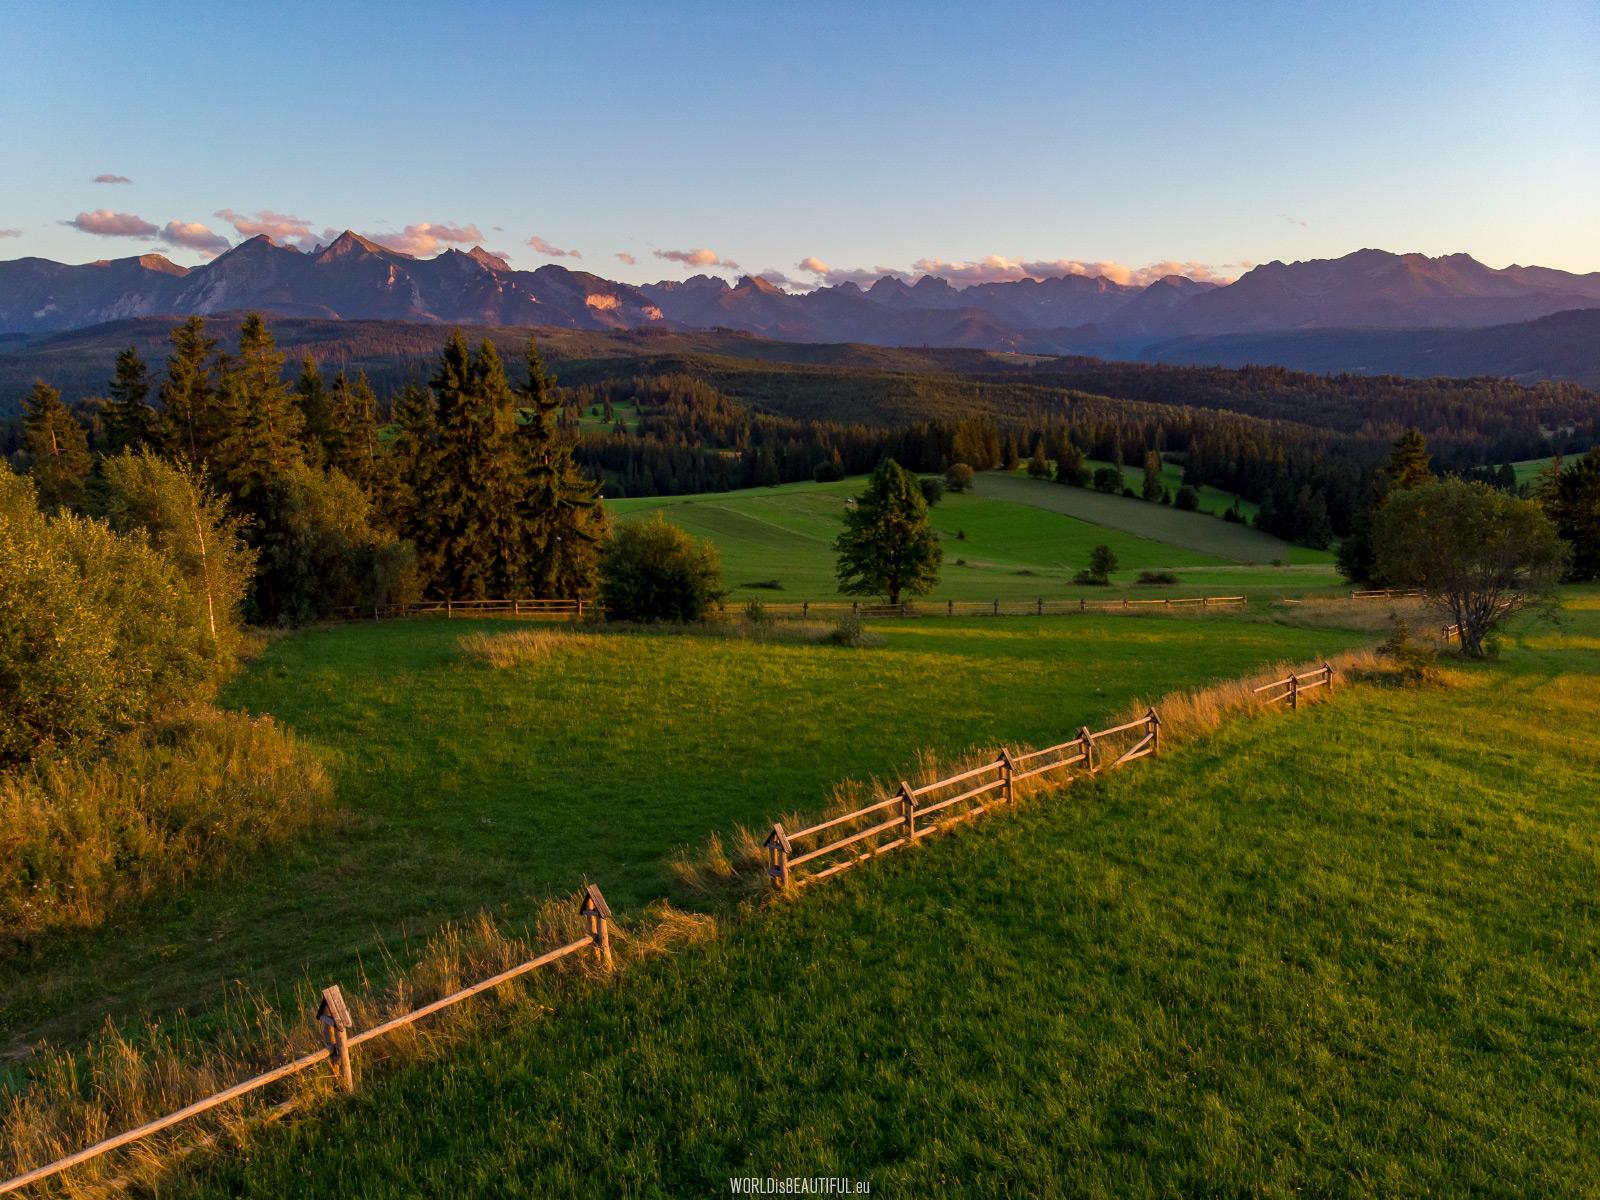 Łapszanka - a view of the Tatra Mountains